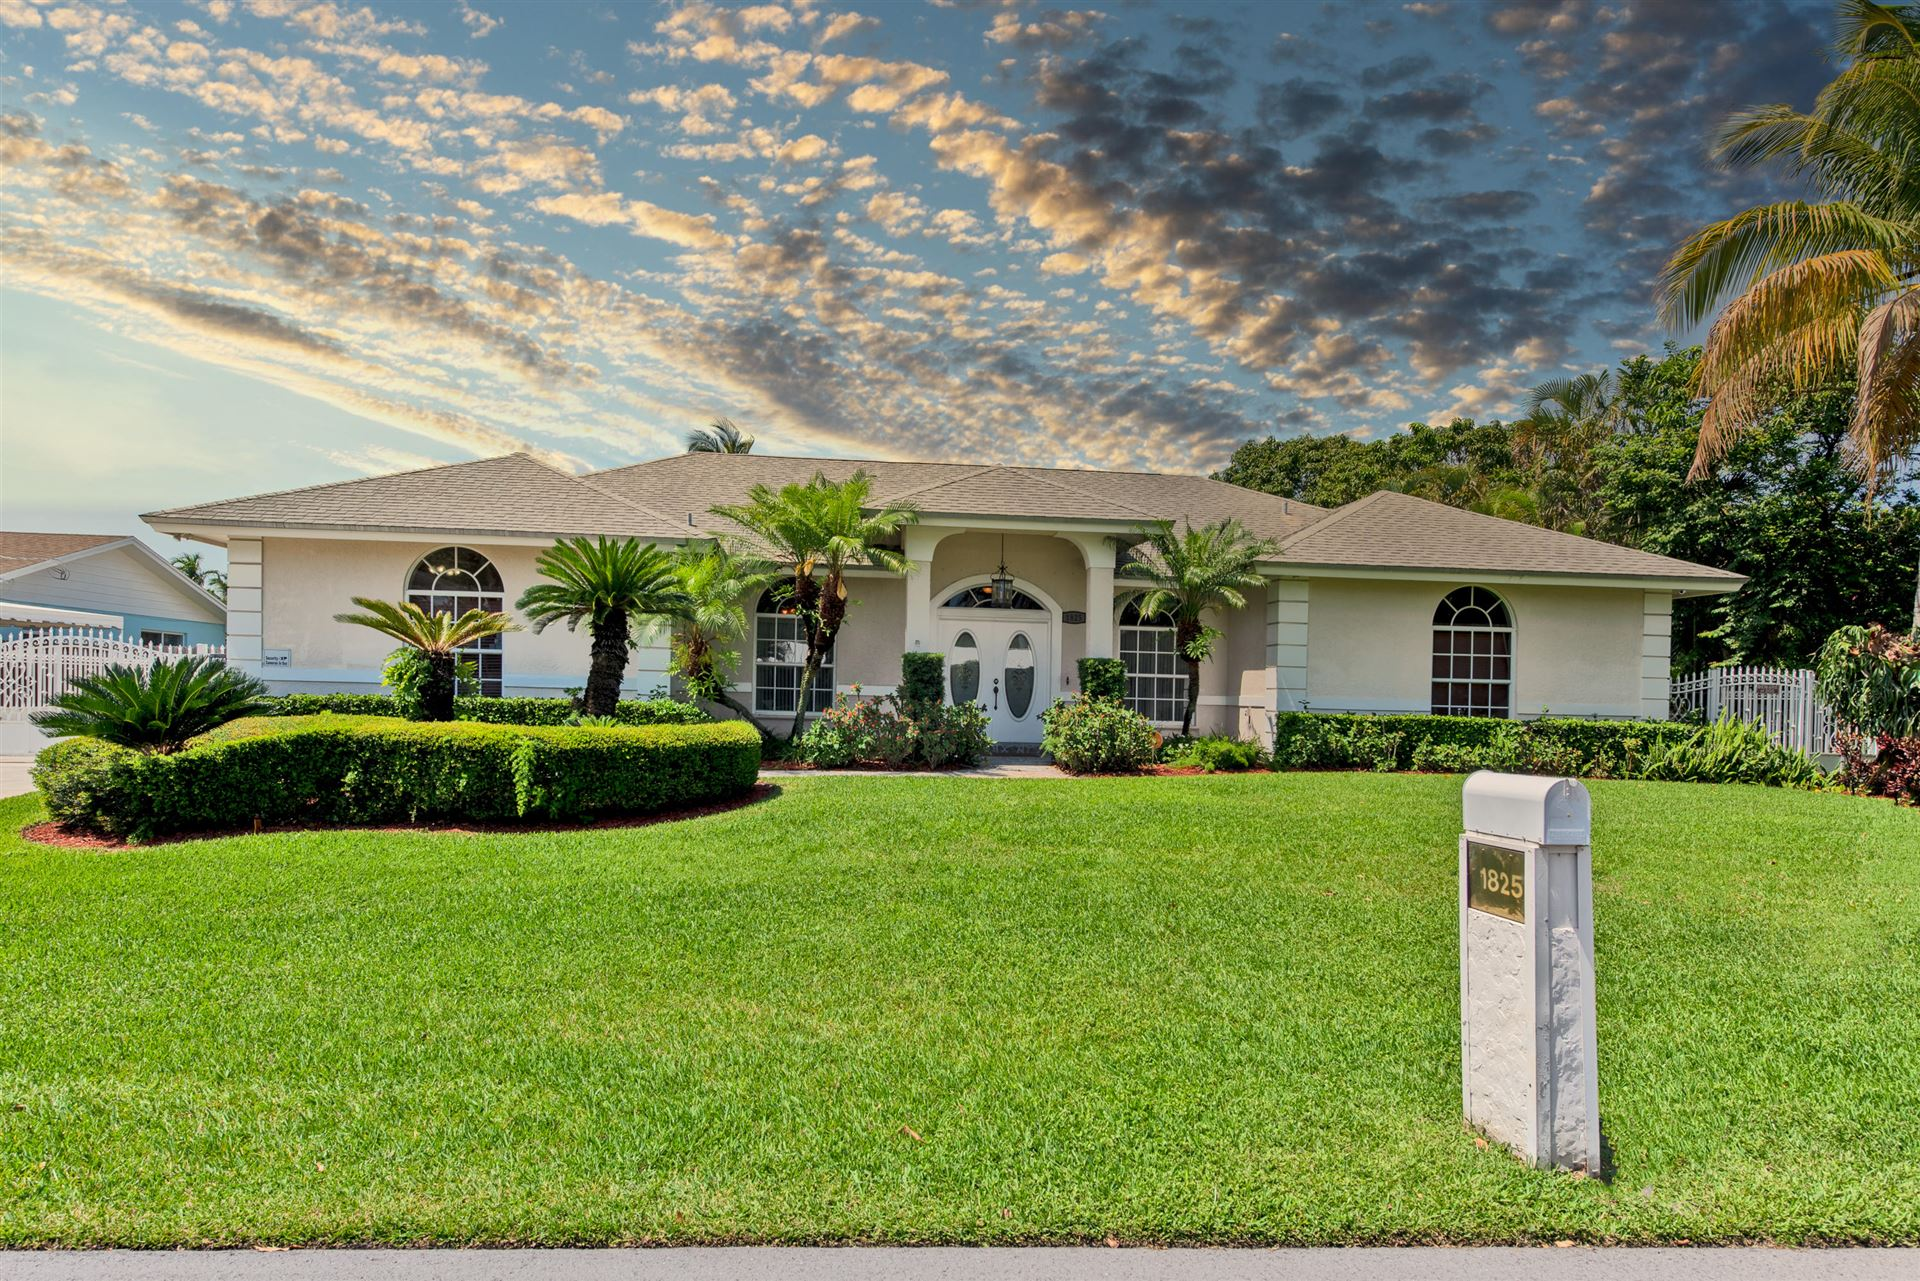 1825 Carandis Road, West Palm Beach, FL 33406 - #: RX-10583864